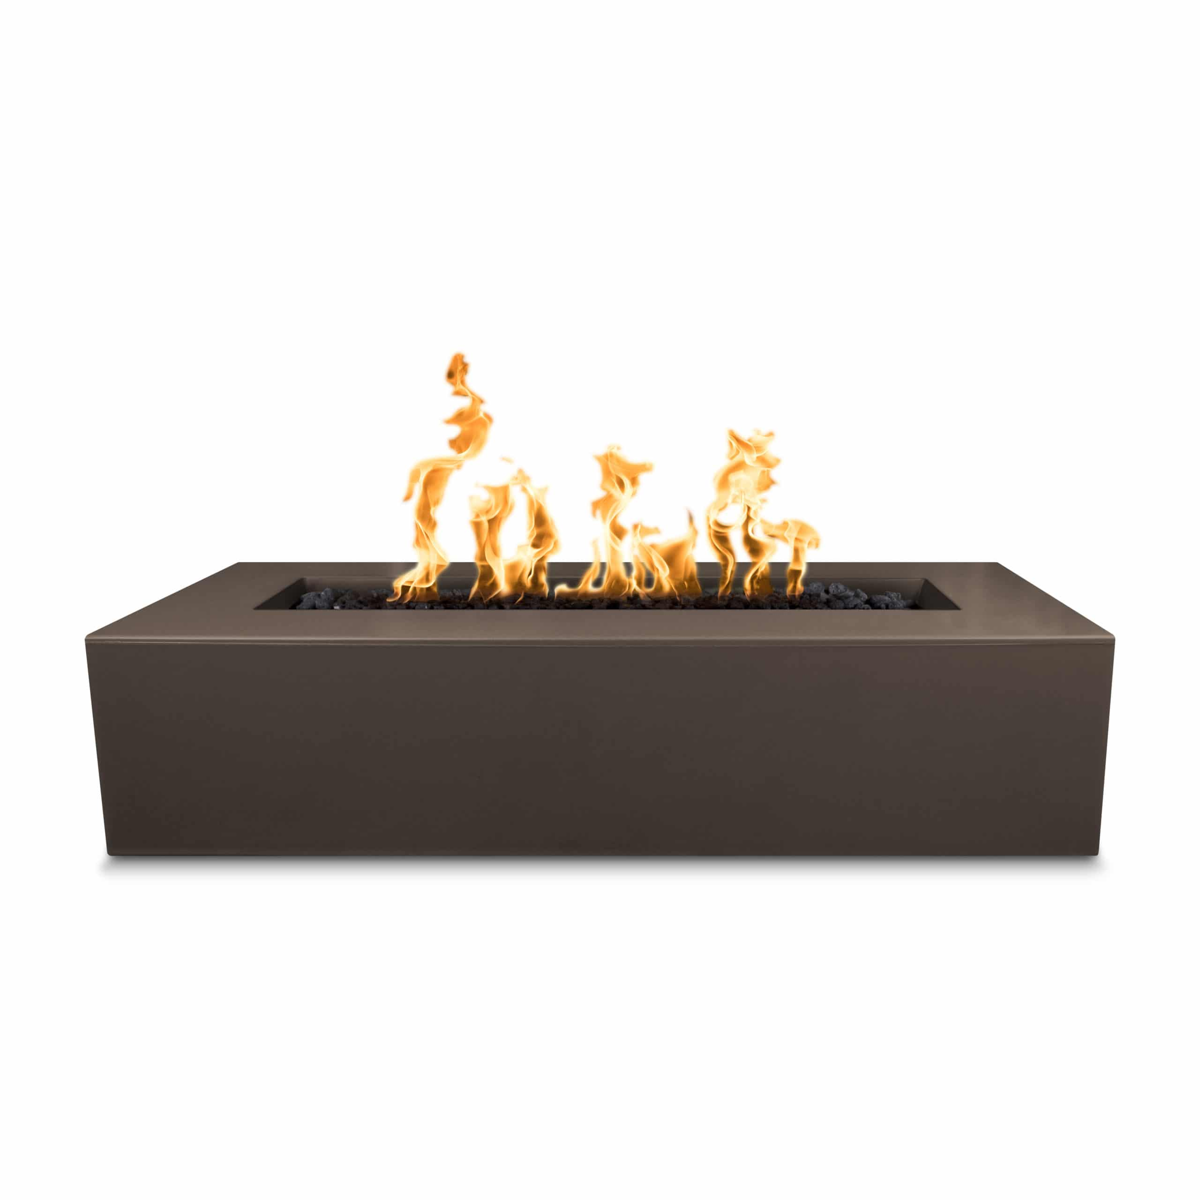 Regal Fire Pit - Chocolate